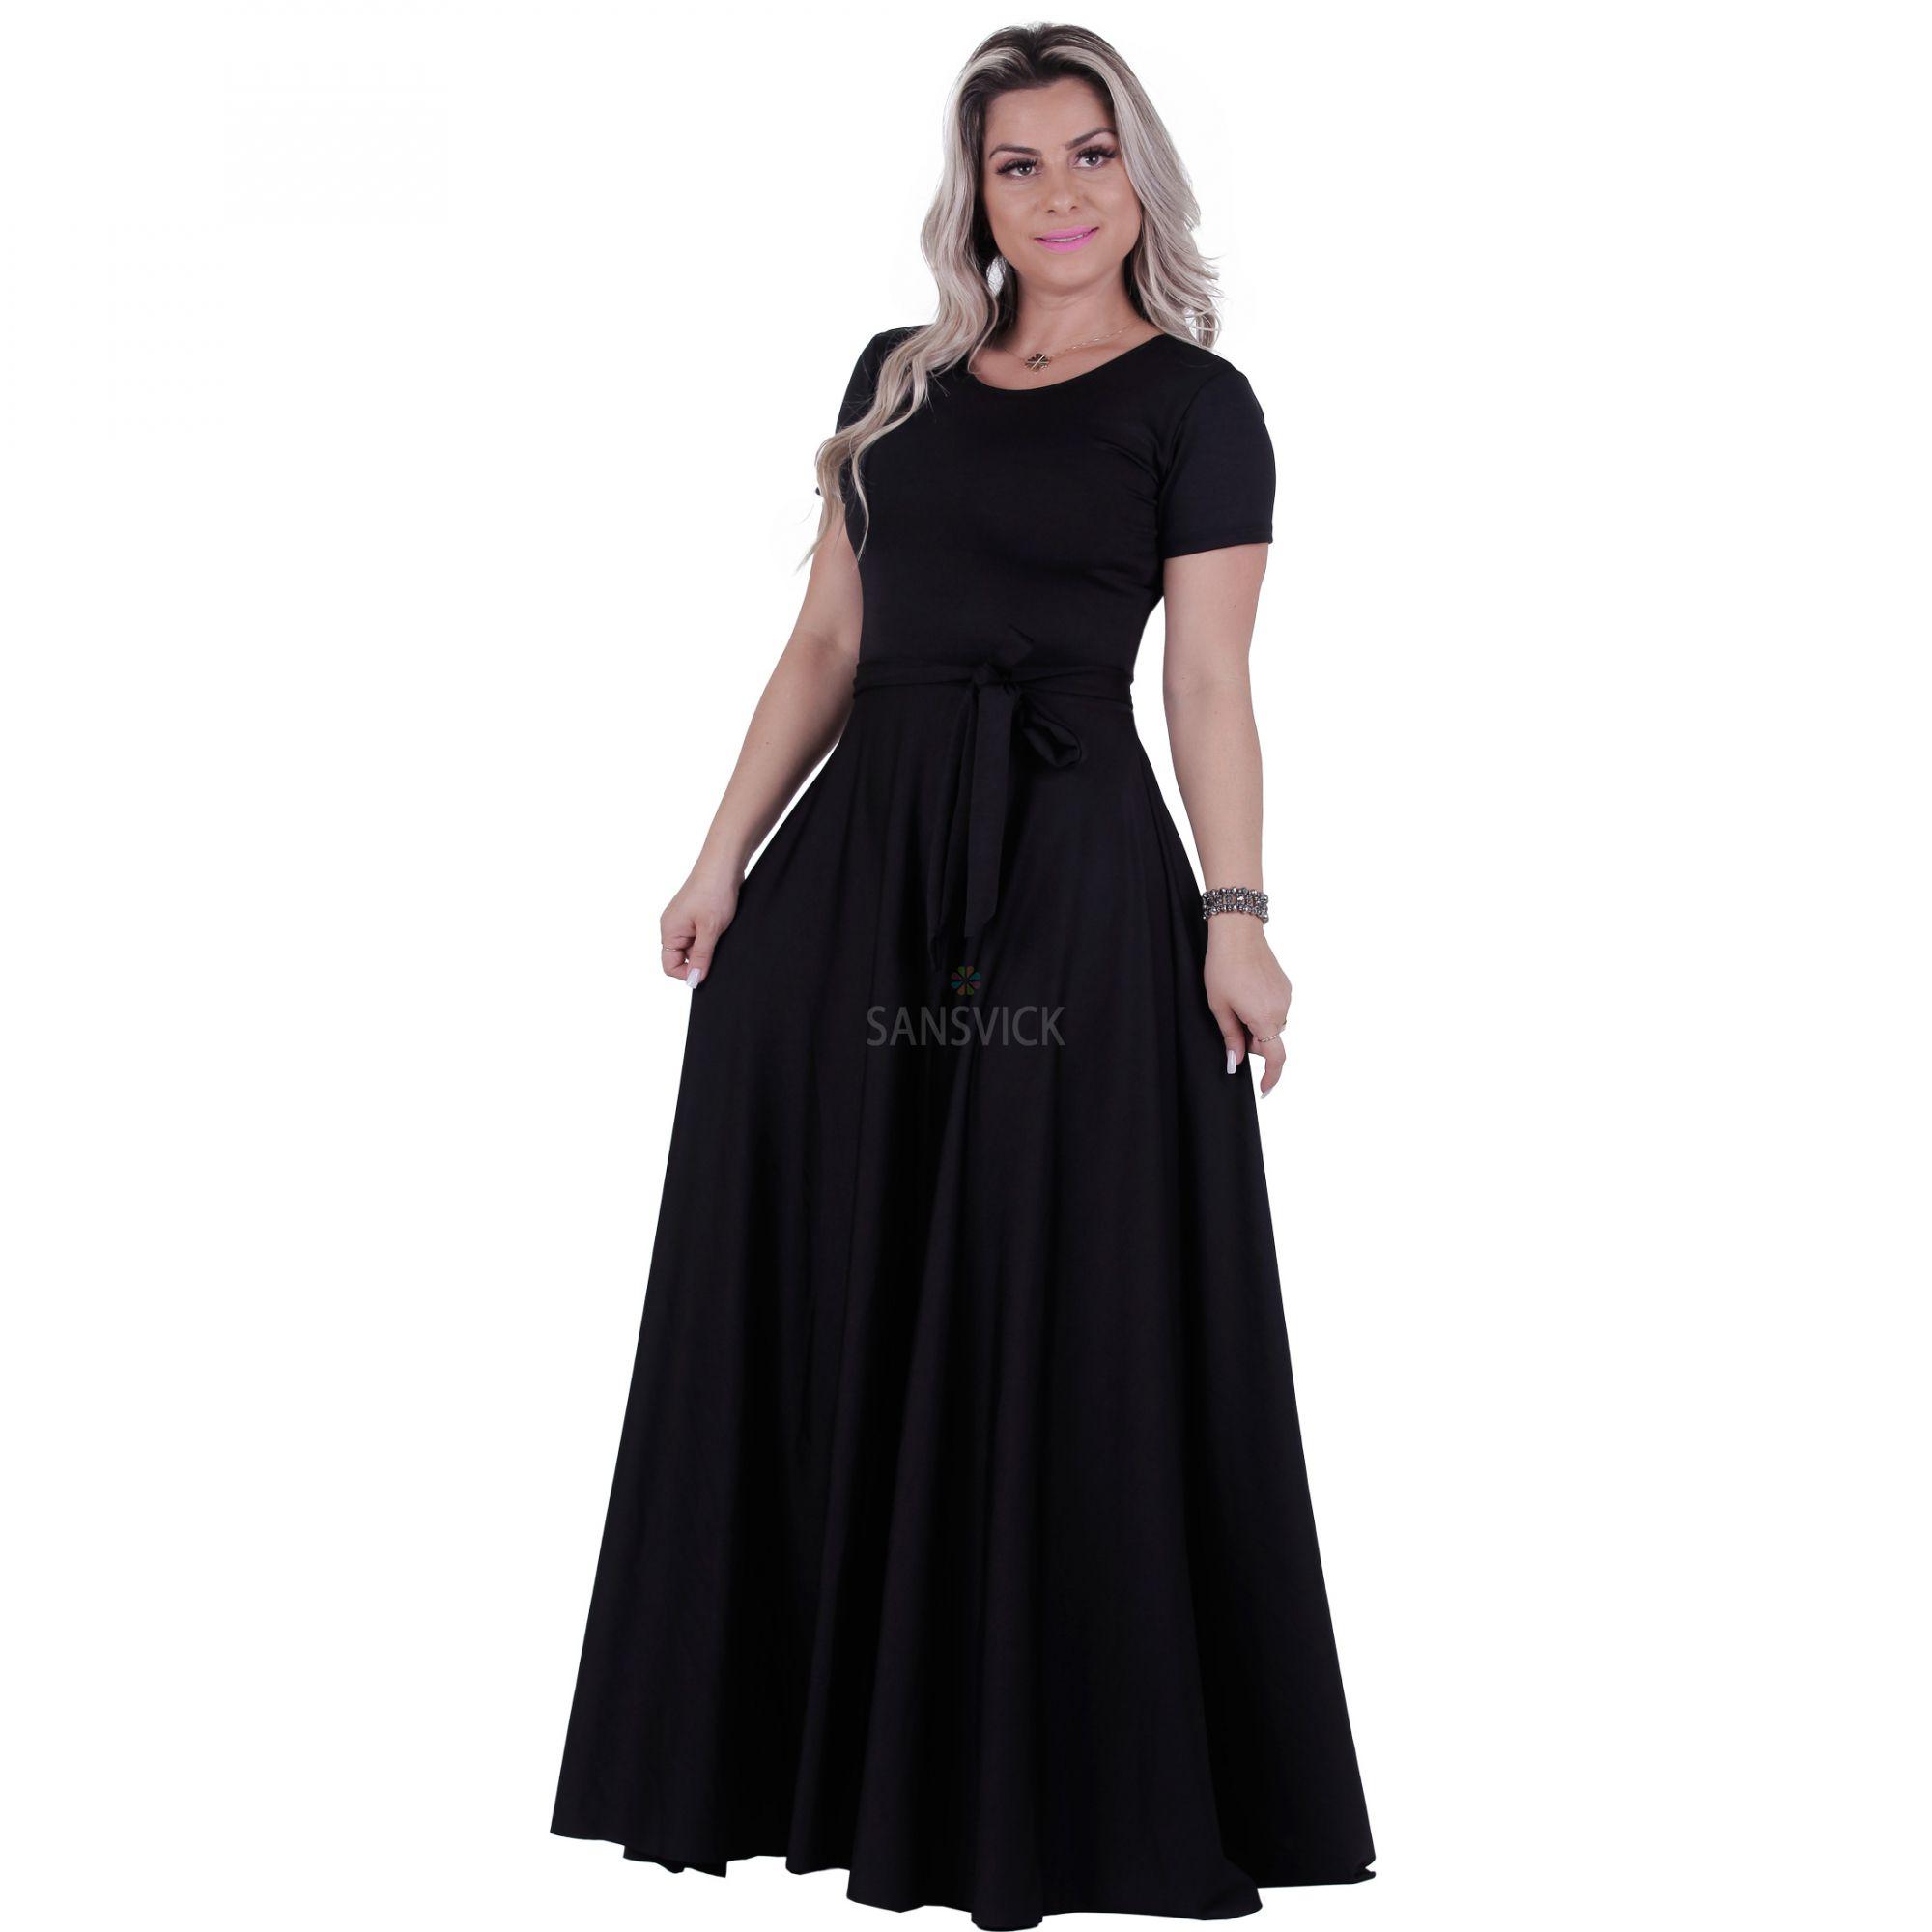 5bea535d5c Vestido Longo Preto - Sansvick Store - Moda Evangélica e Executiva